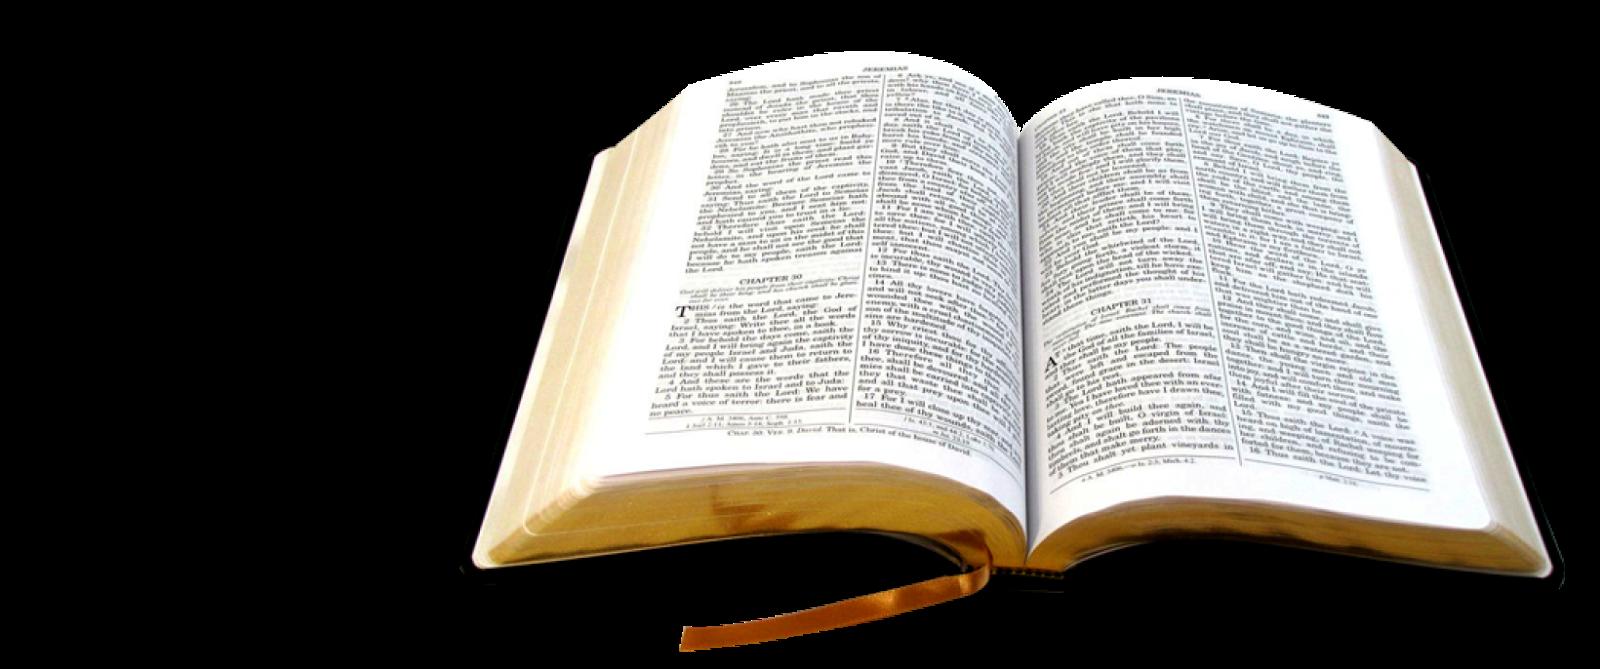 El Matrimonio Biblia Reina Valera : Biblia catolica descargar reina valera gratis